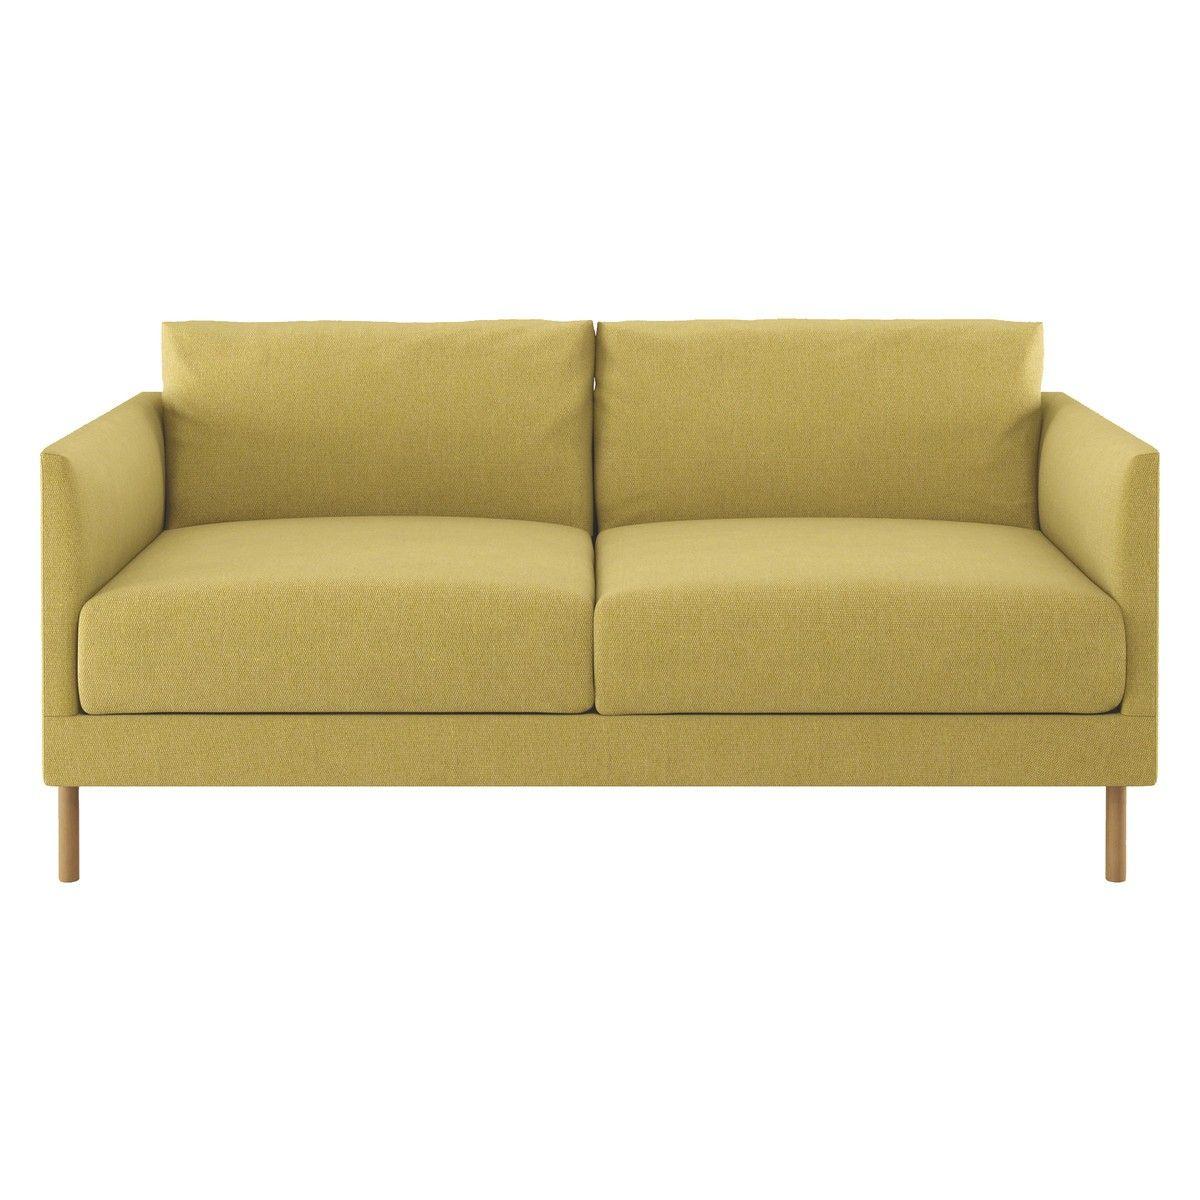 Hyde Yellow Fabric 2 Seater Sofa Wooden Legs Now At Habitat Uk